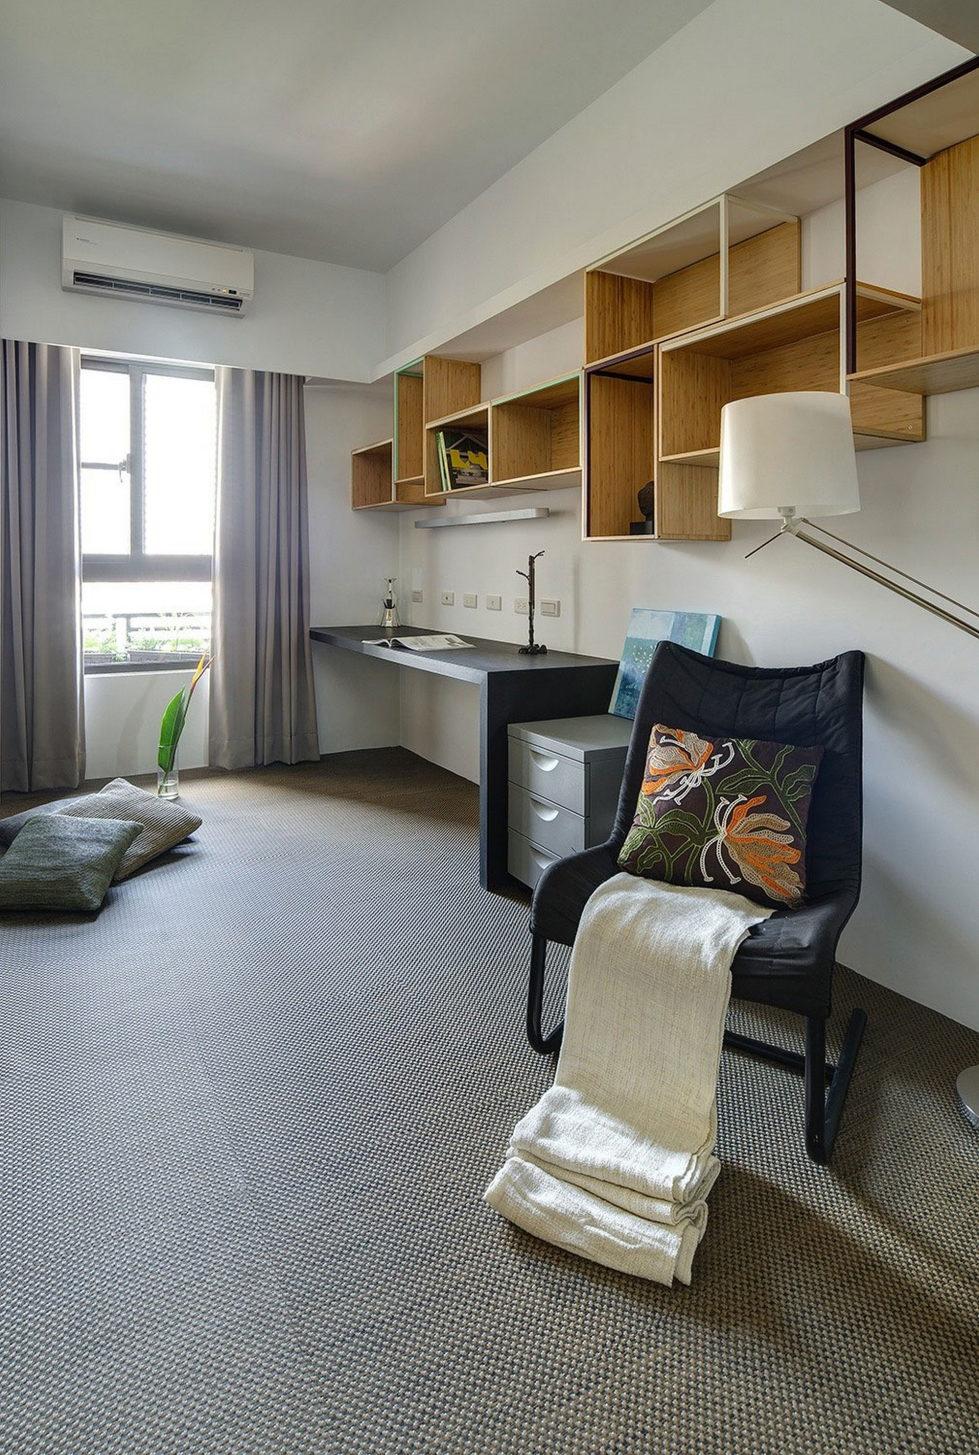 Wood Box Apartments From Cloud Pen Studio In Taichung, Taiwan 37